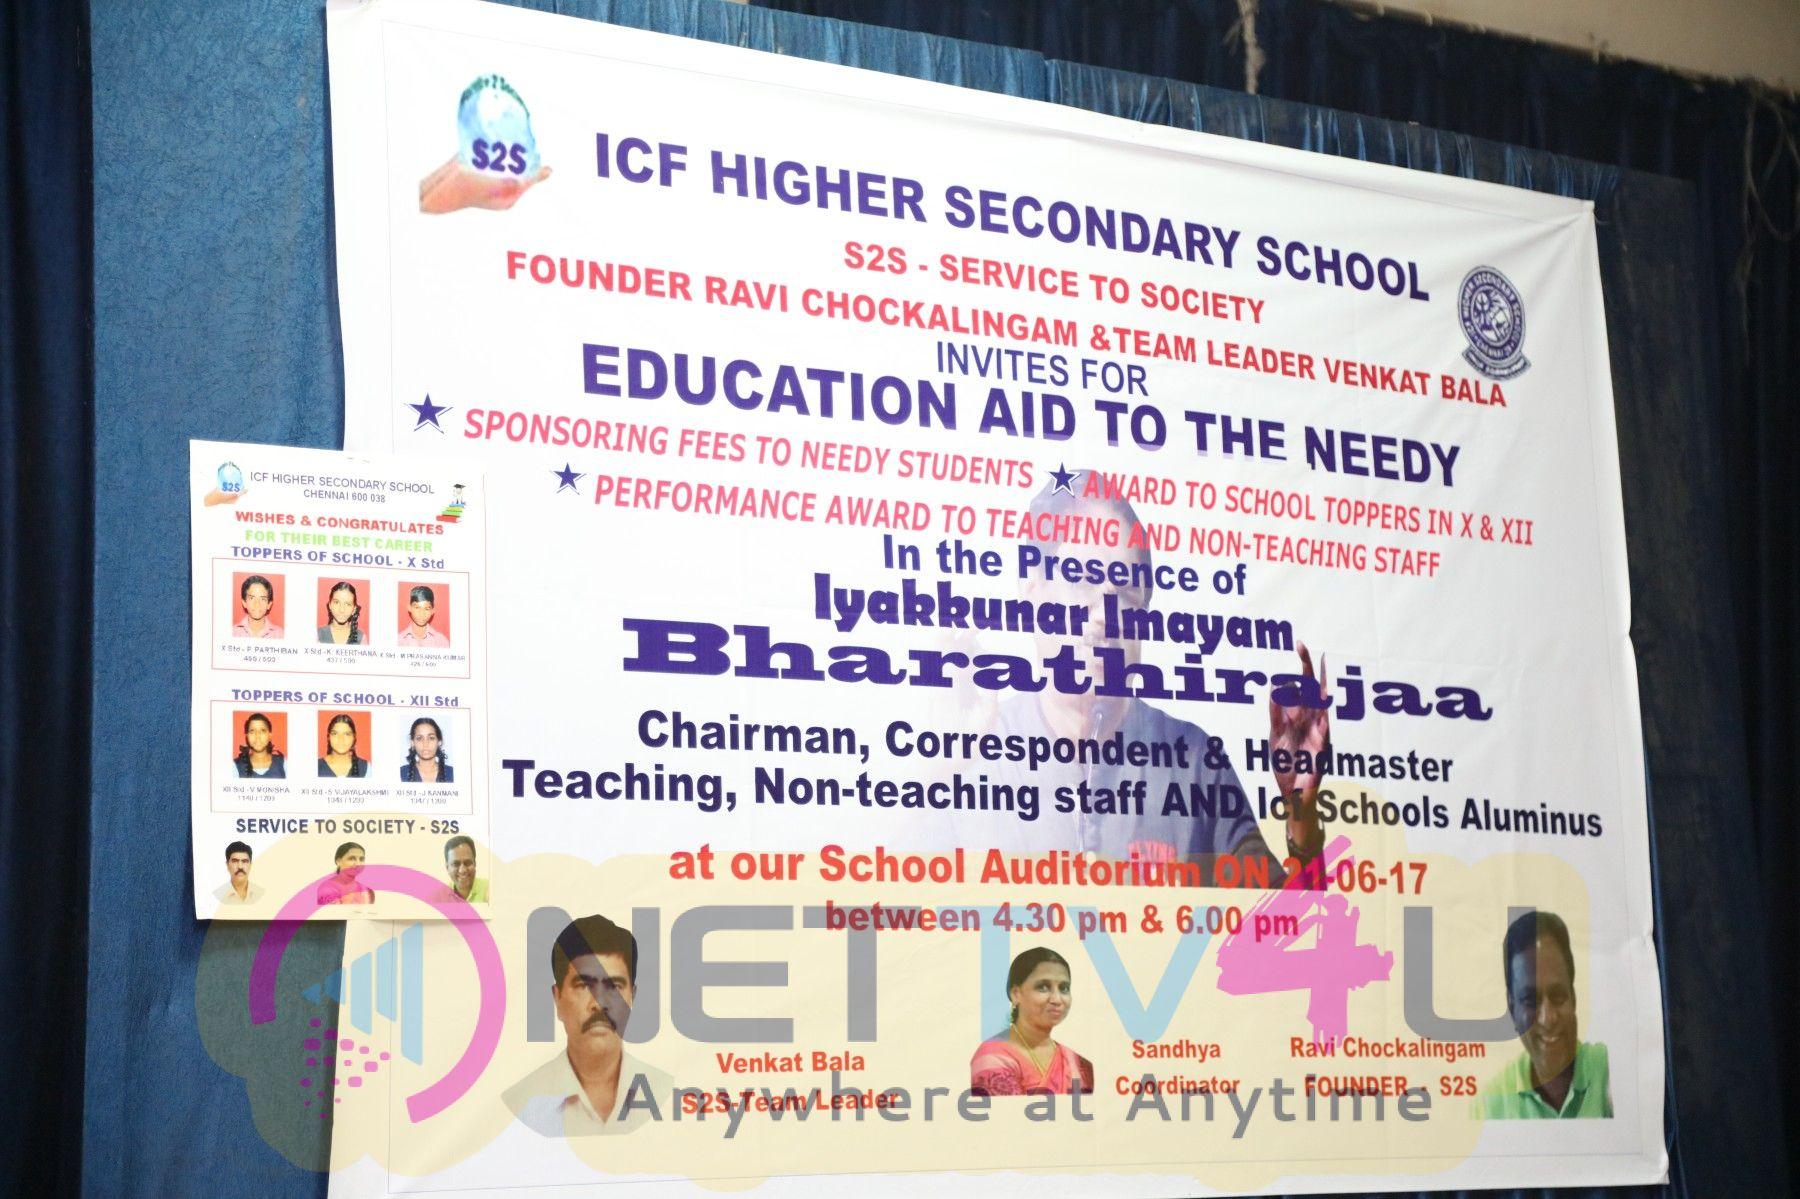 Iyakunar Imayam Bharathiraja At Service To Society (S2S) 6th Educational AID Program - ICF Higher Secondary School Photos